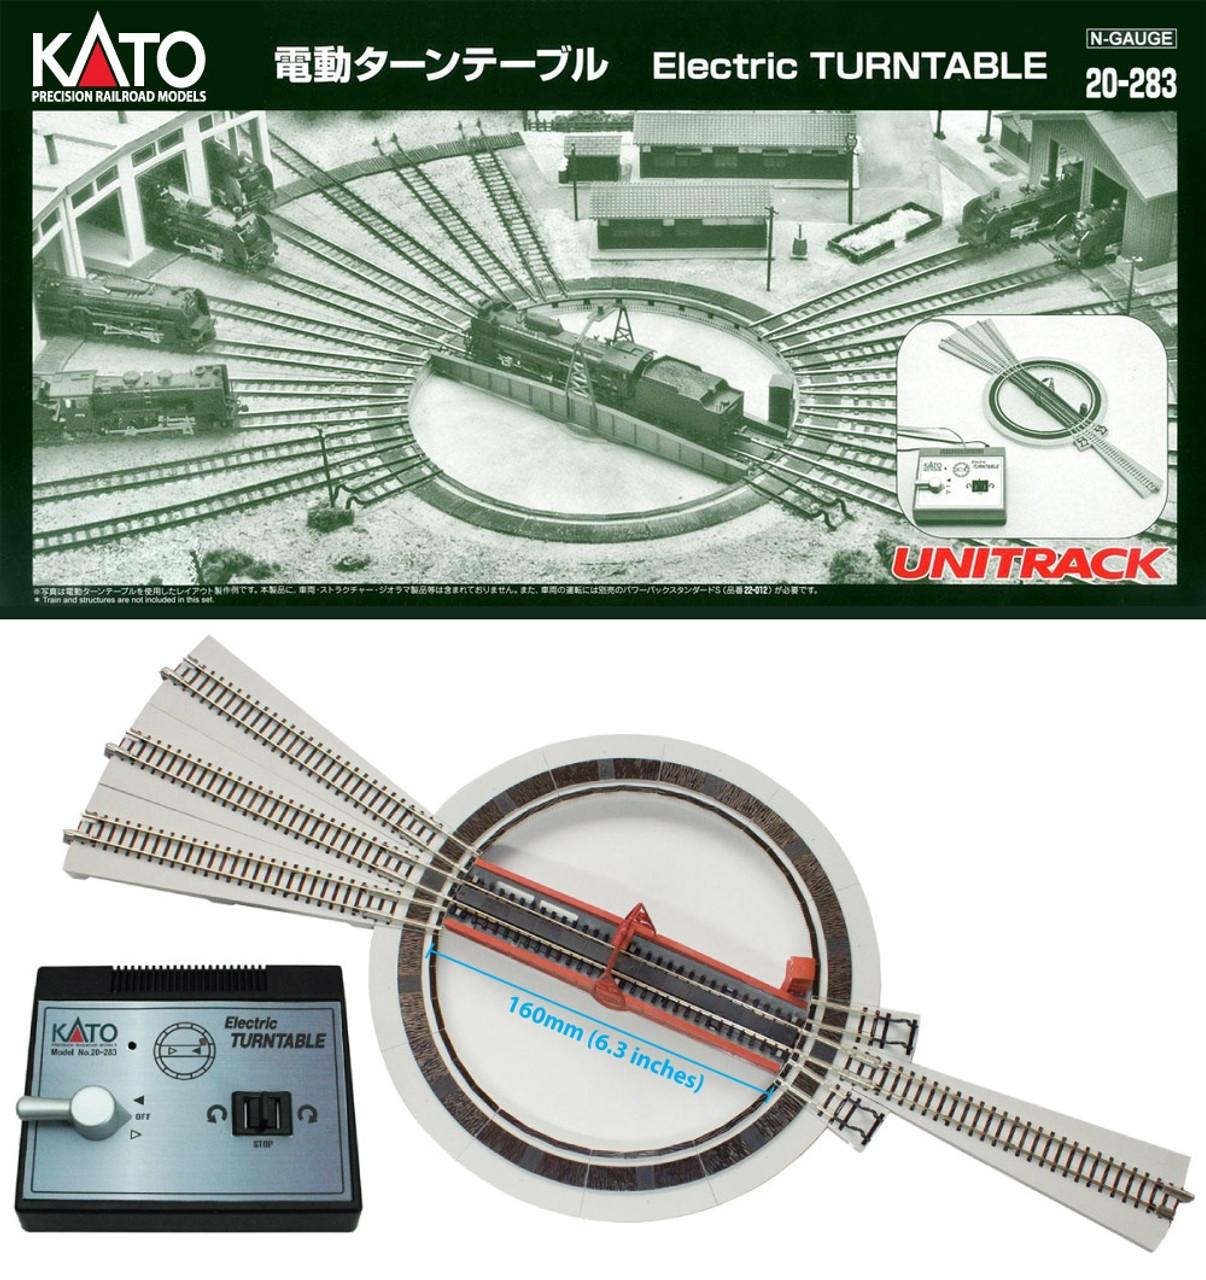 Kato Train Track Wiring Wiring Diagrams border=